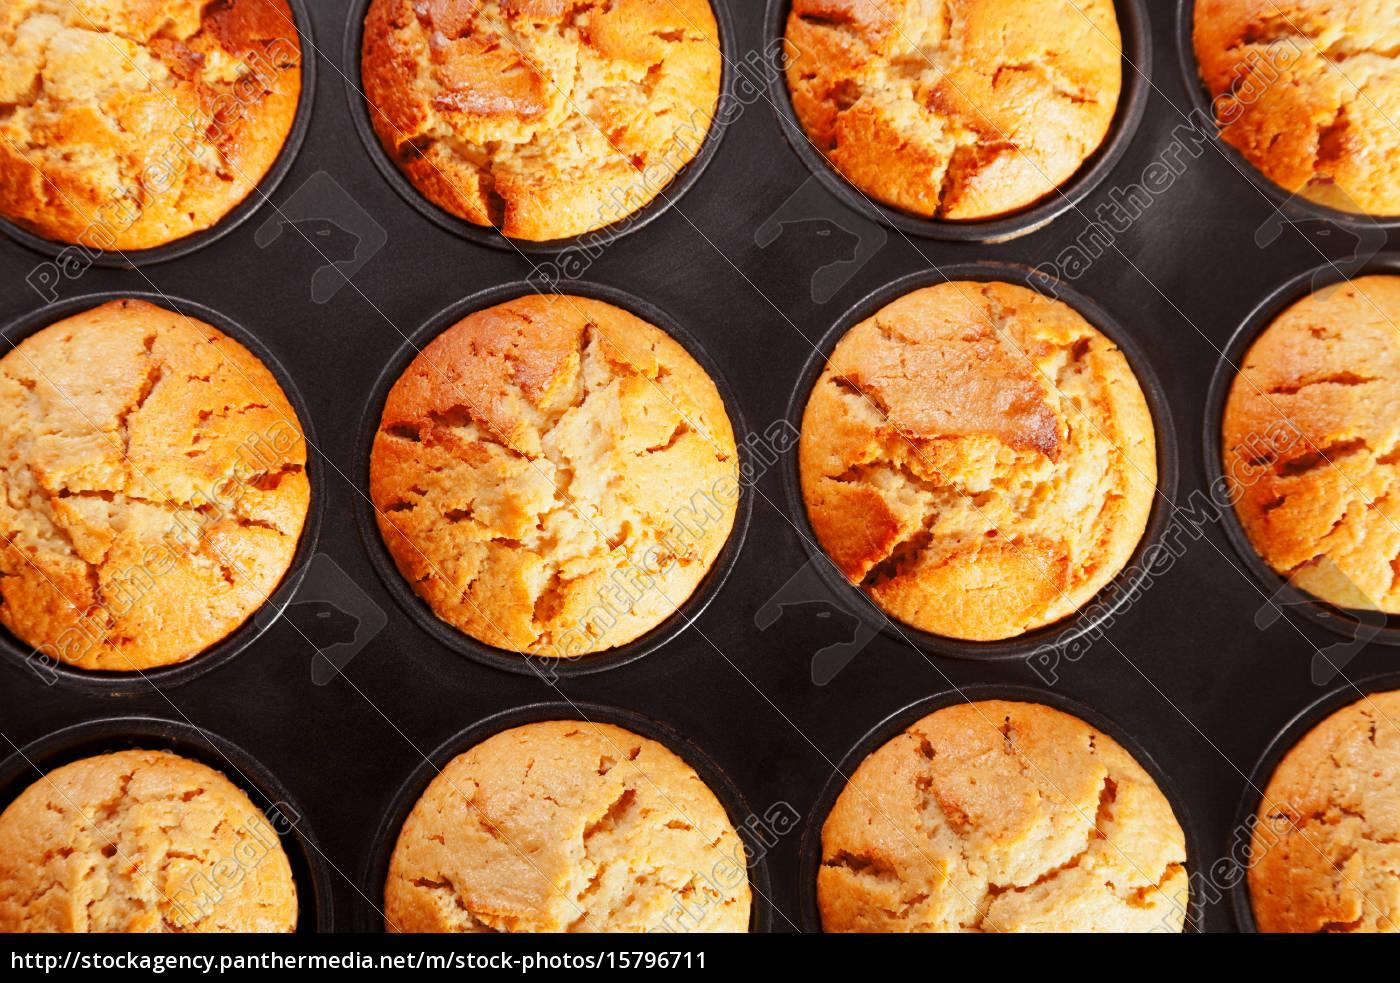 muffins, muffins, muffins, muffins - 15796711